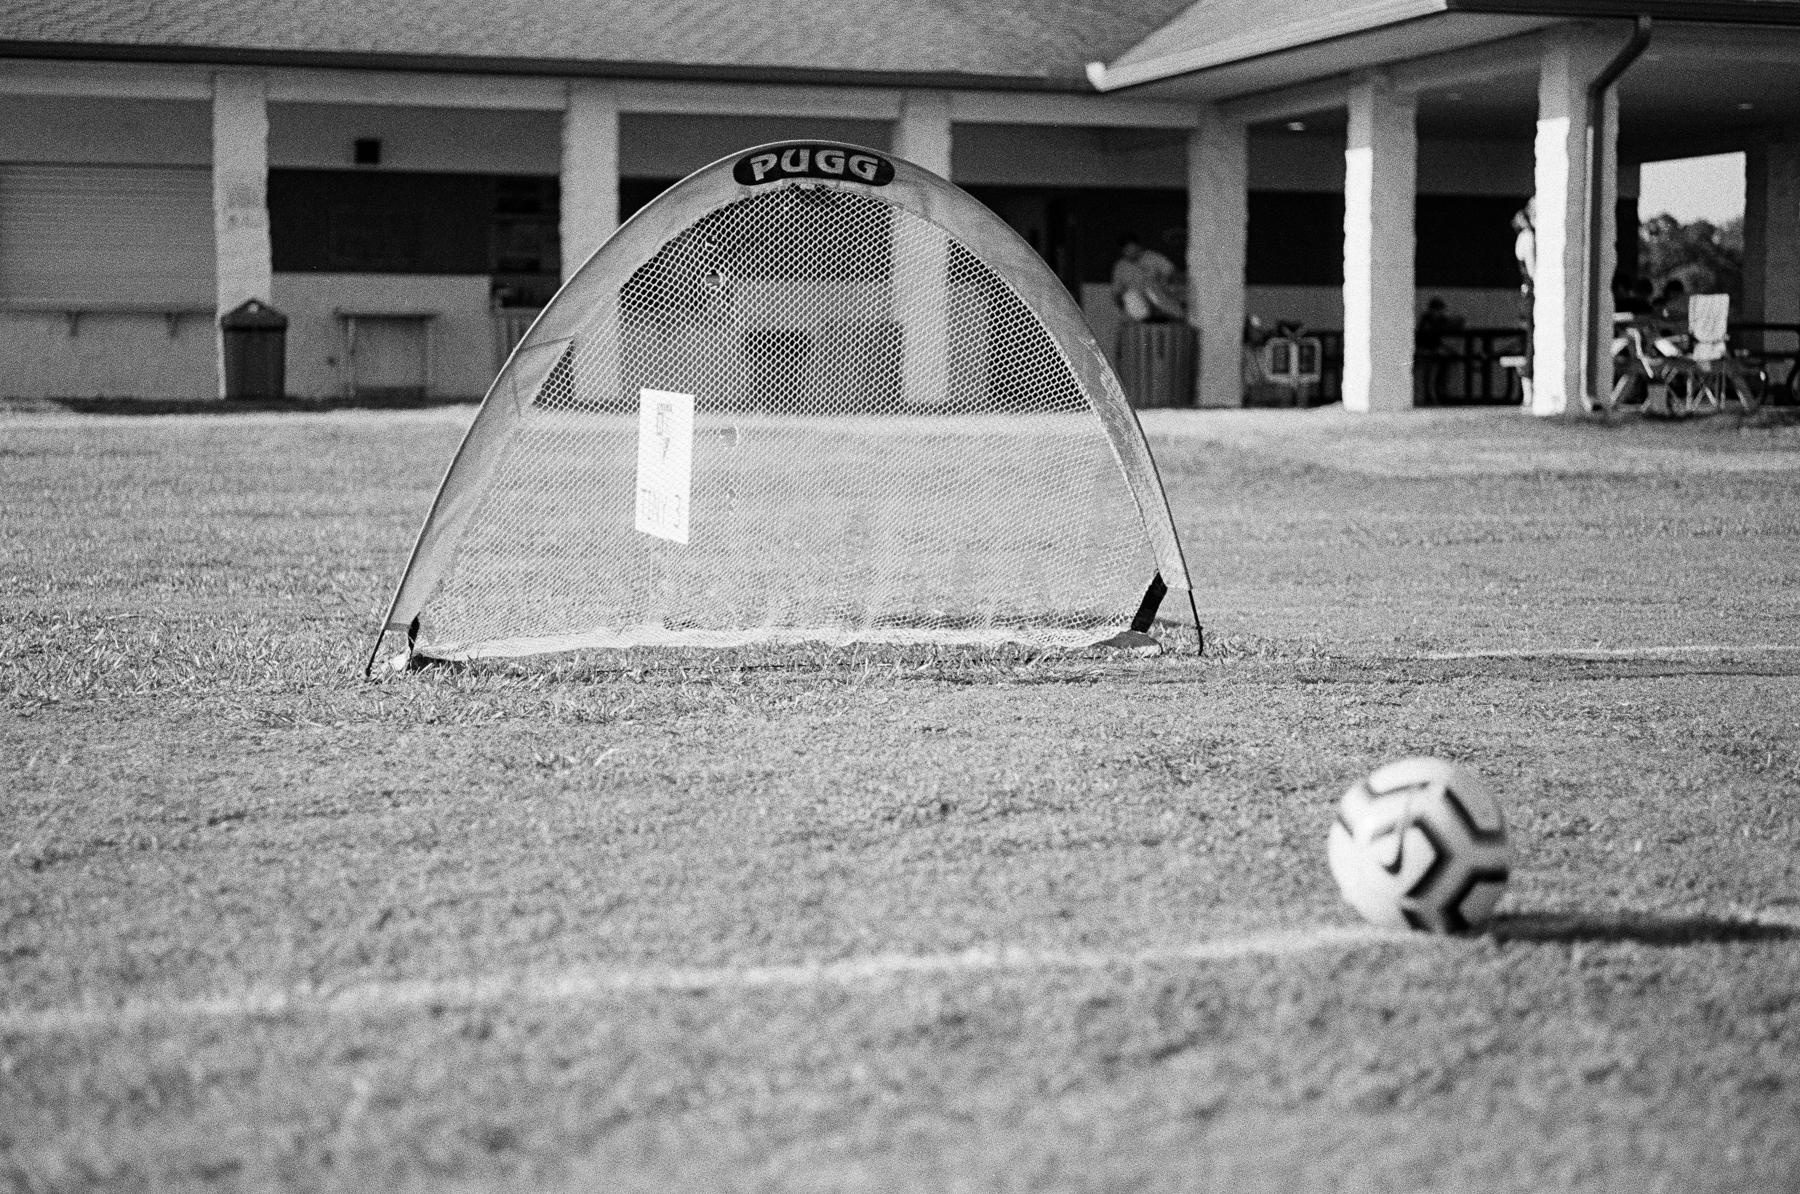 Chloe-Soccer-B&W-MA-5-2.jpg